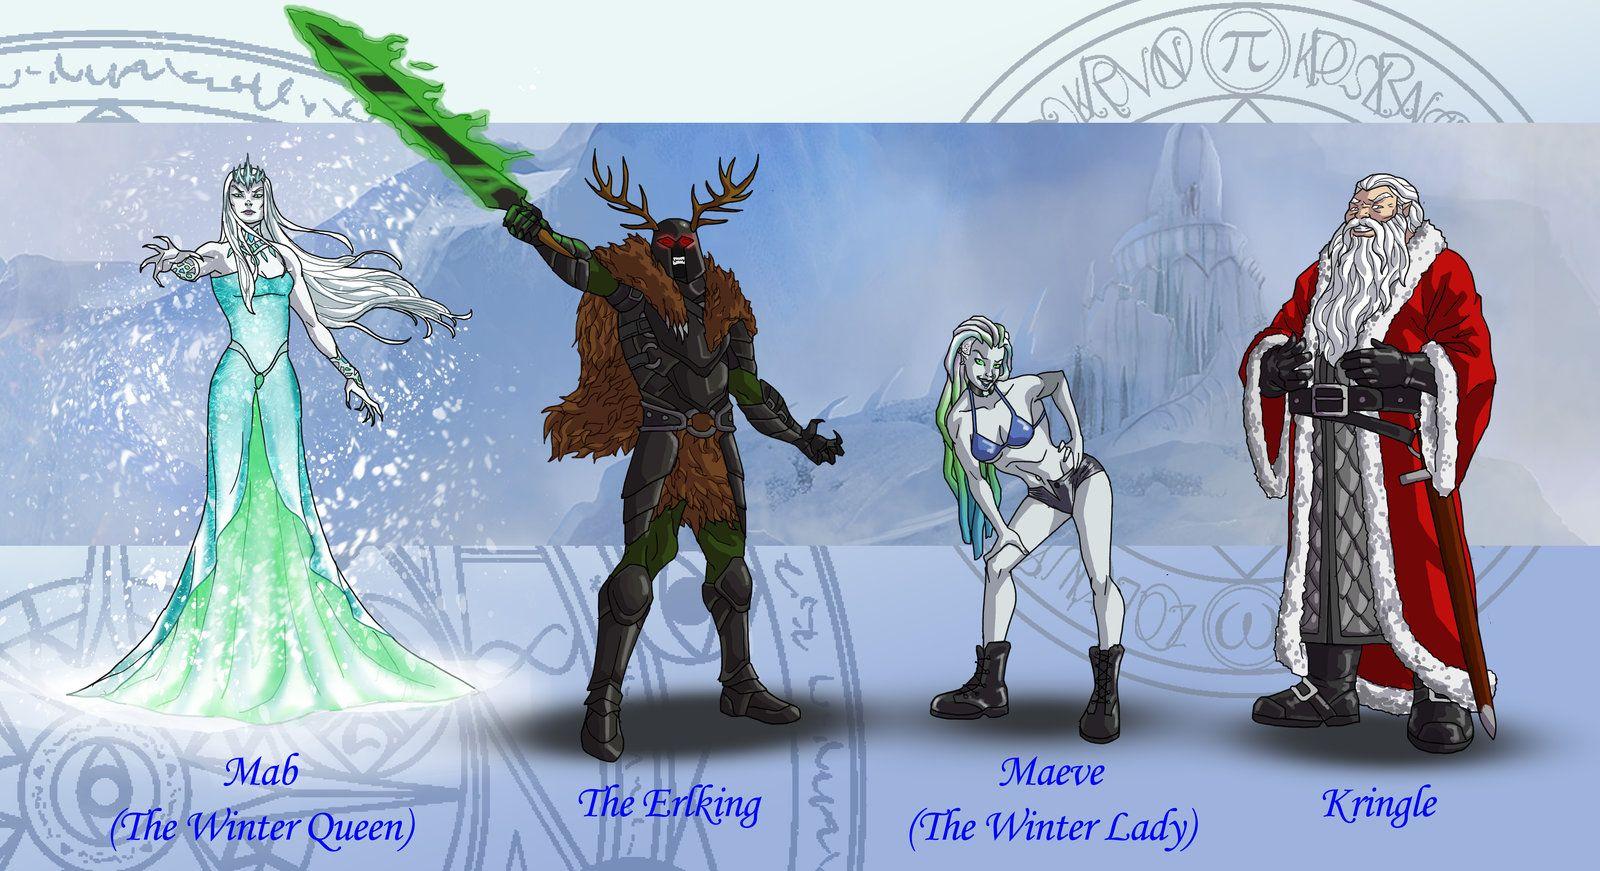 Dresden Files Characters 5 By Wildcard24iantart On @deviantart